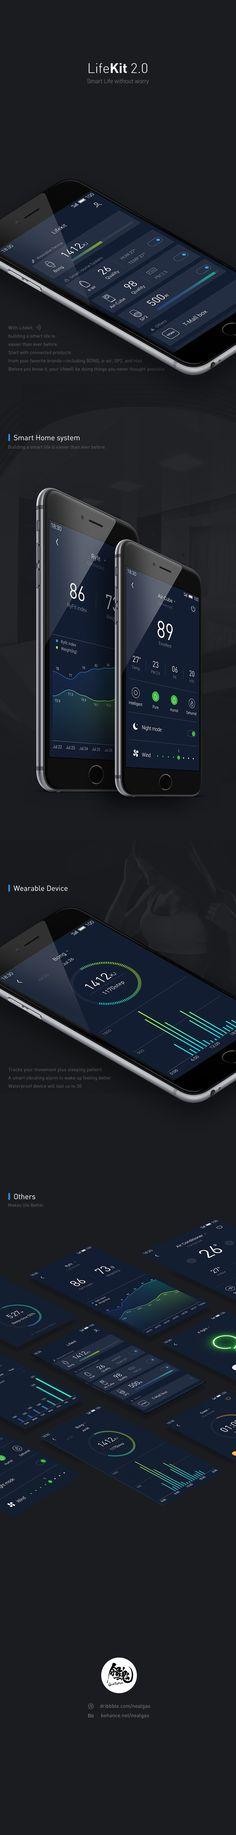 Lifekit 2.0 on Behance